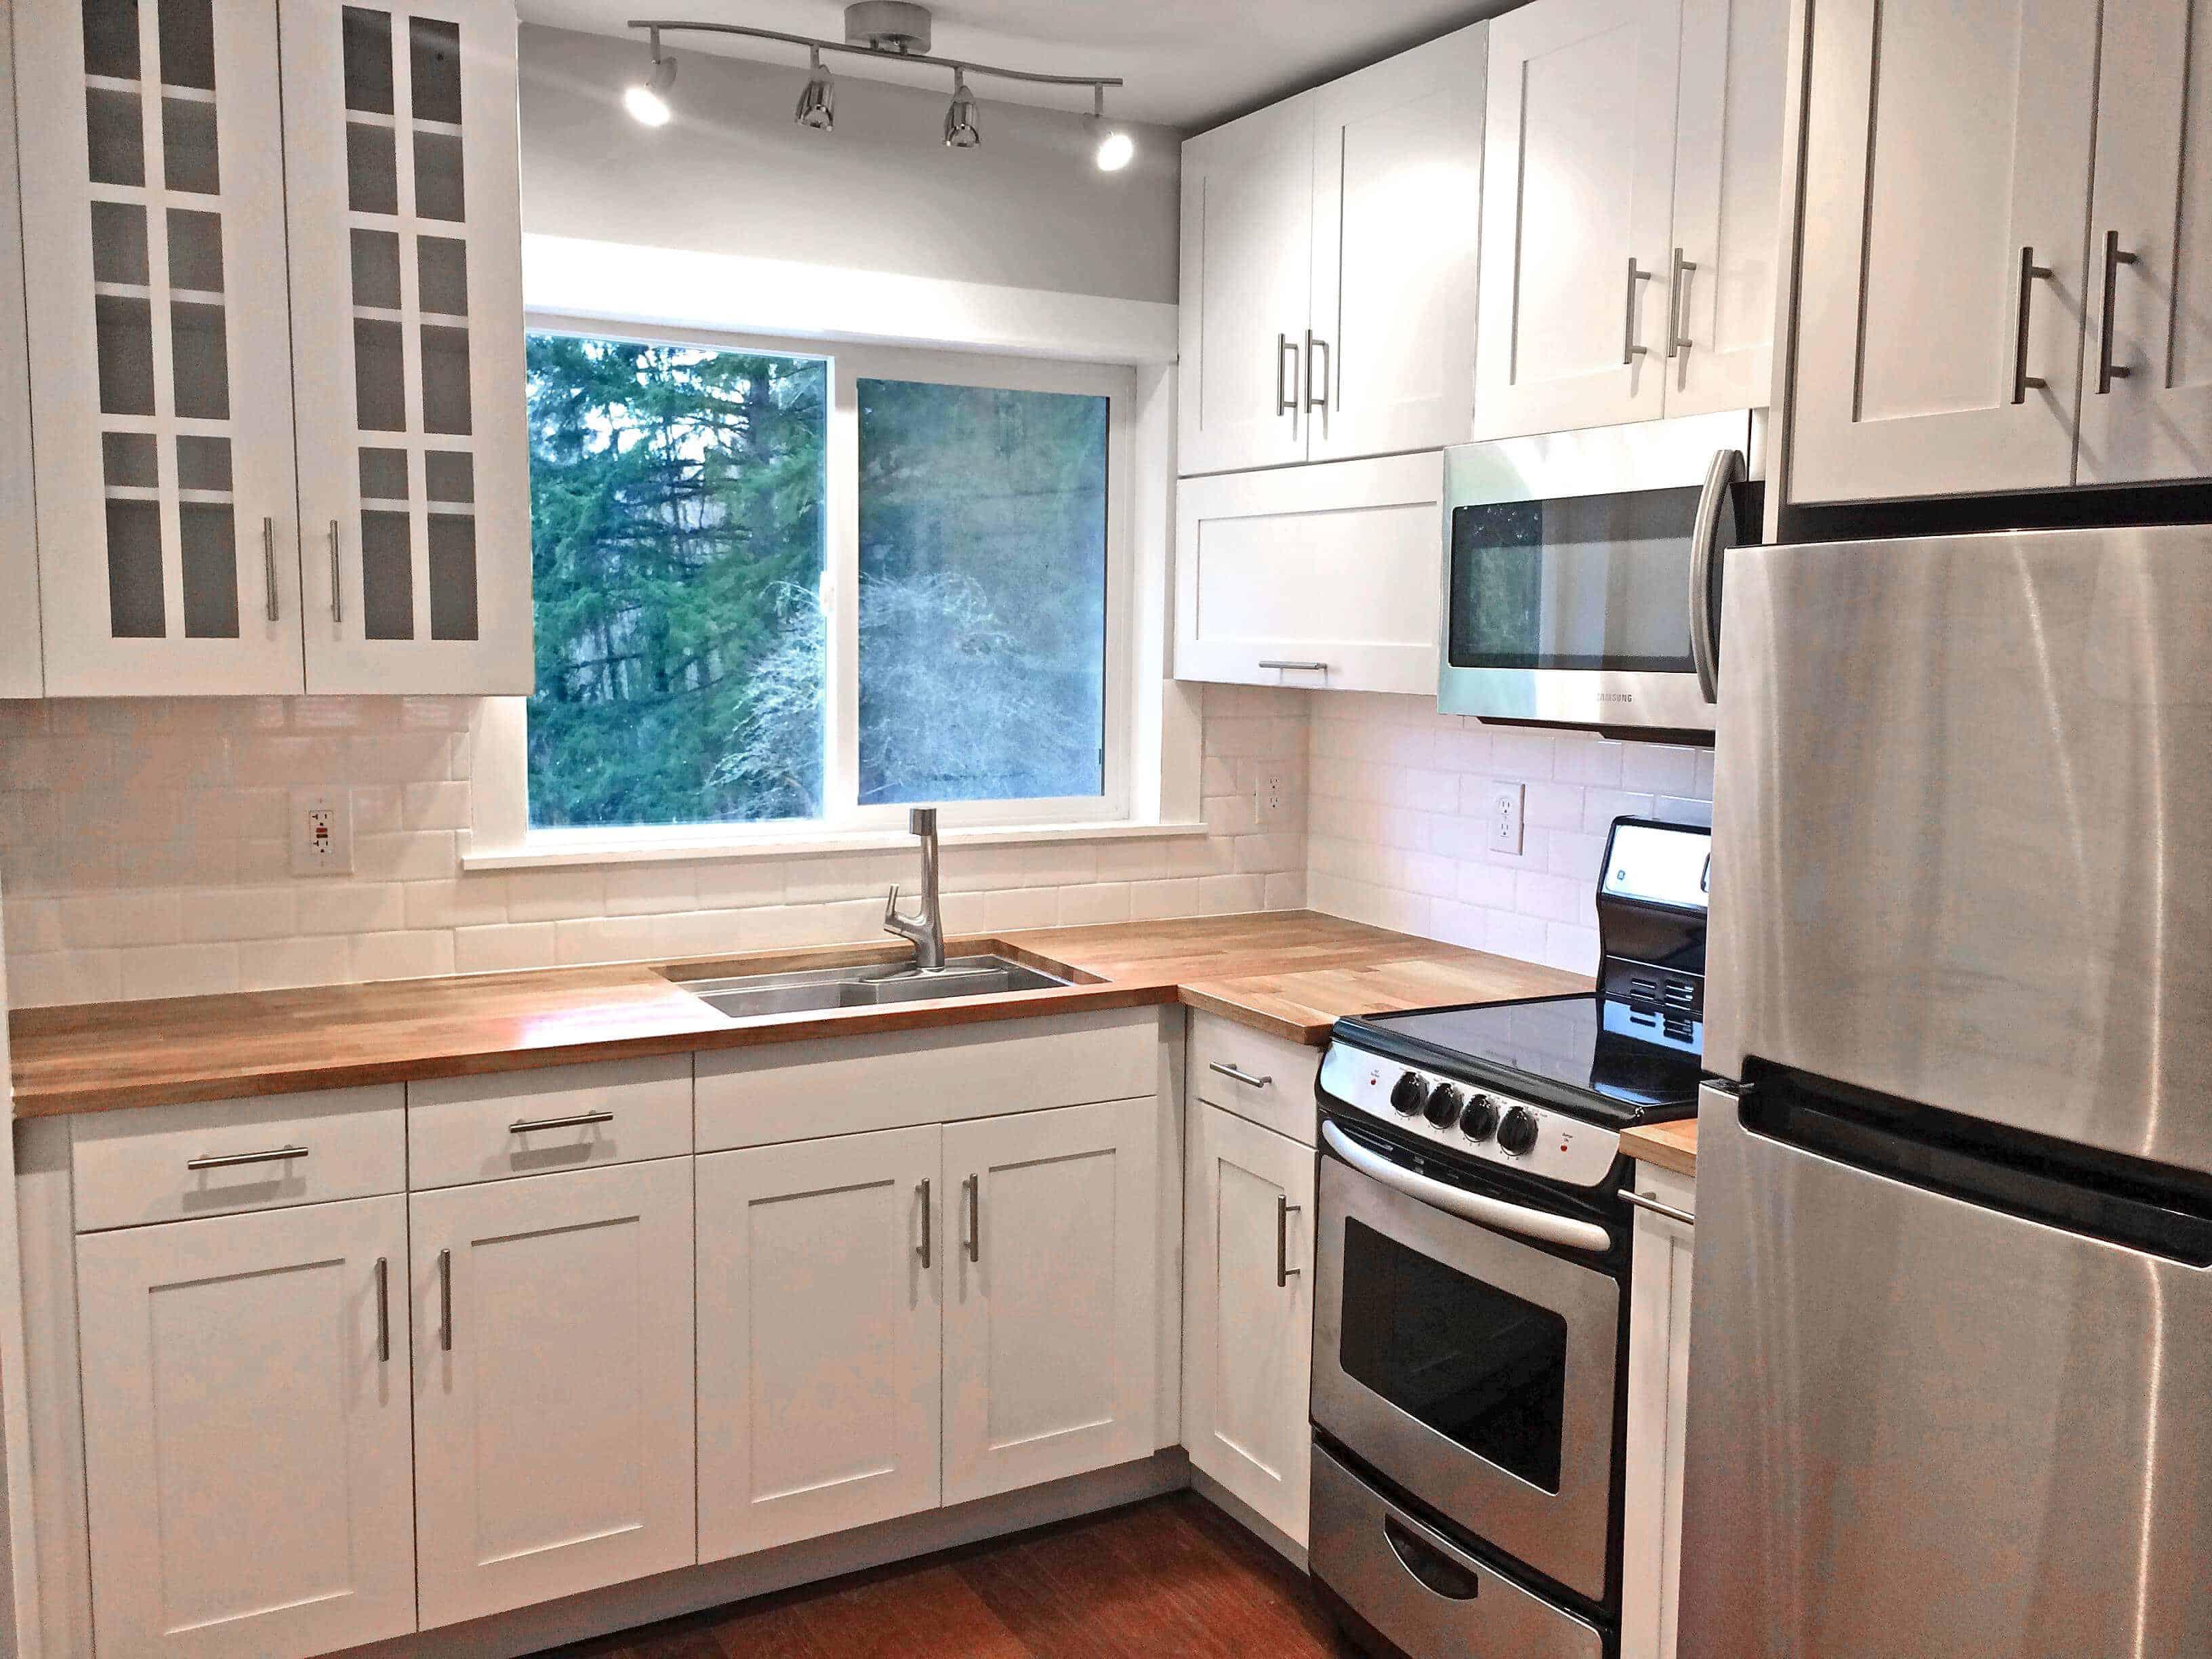 Bellmont Kitchen Cabinets Reviews